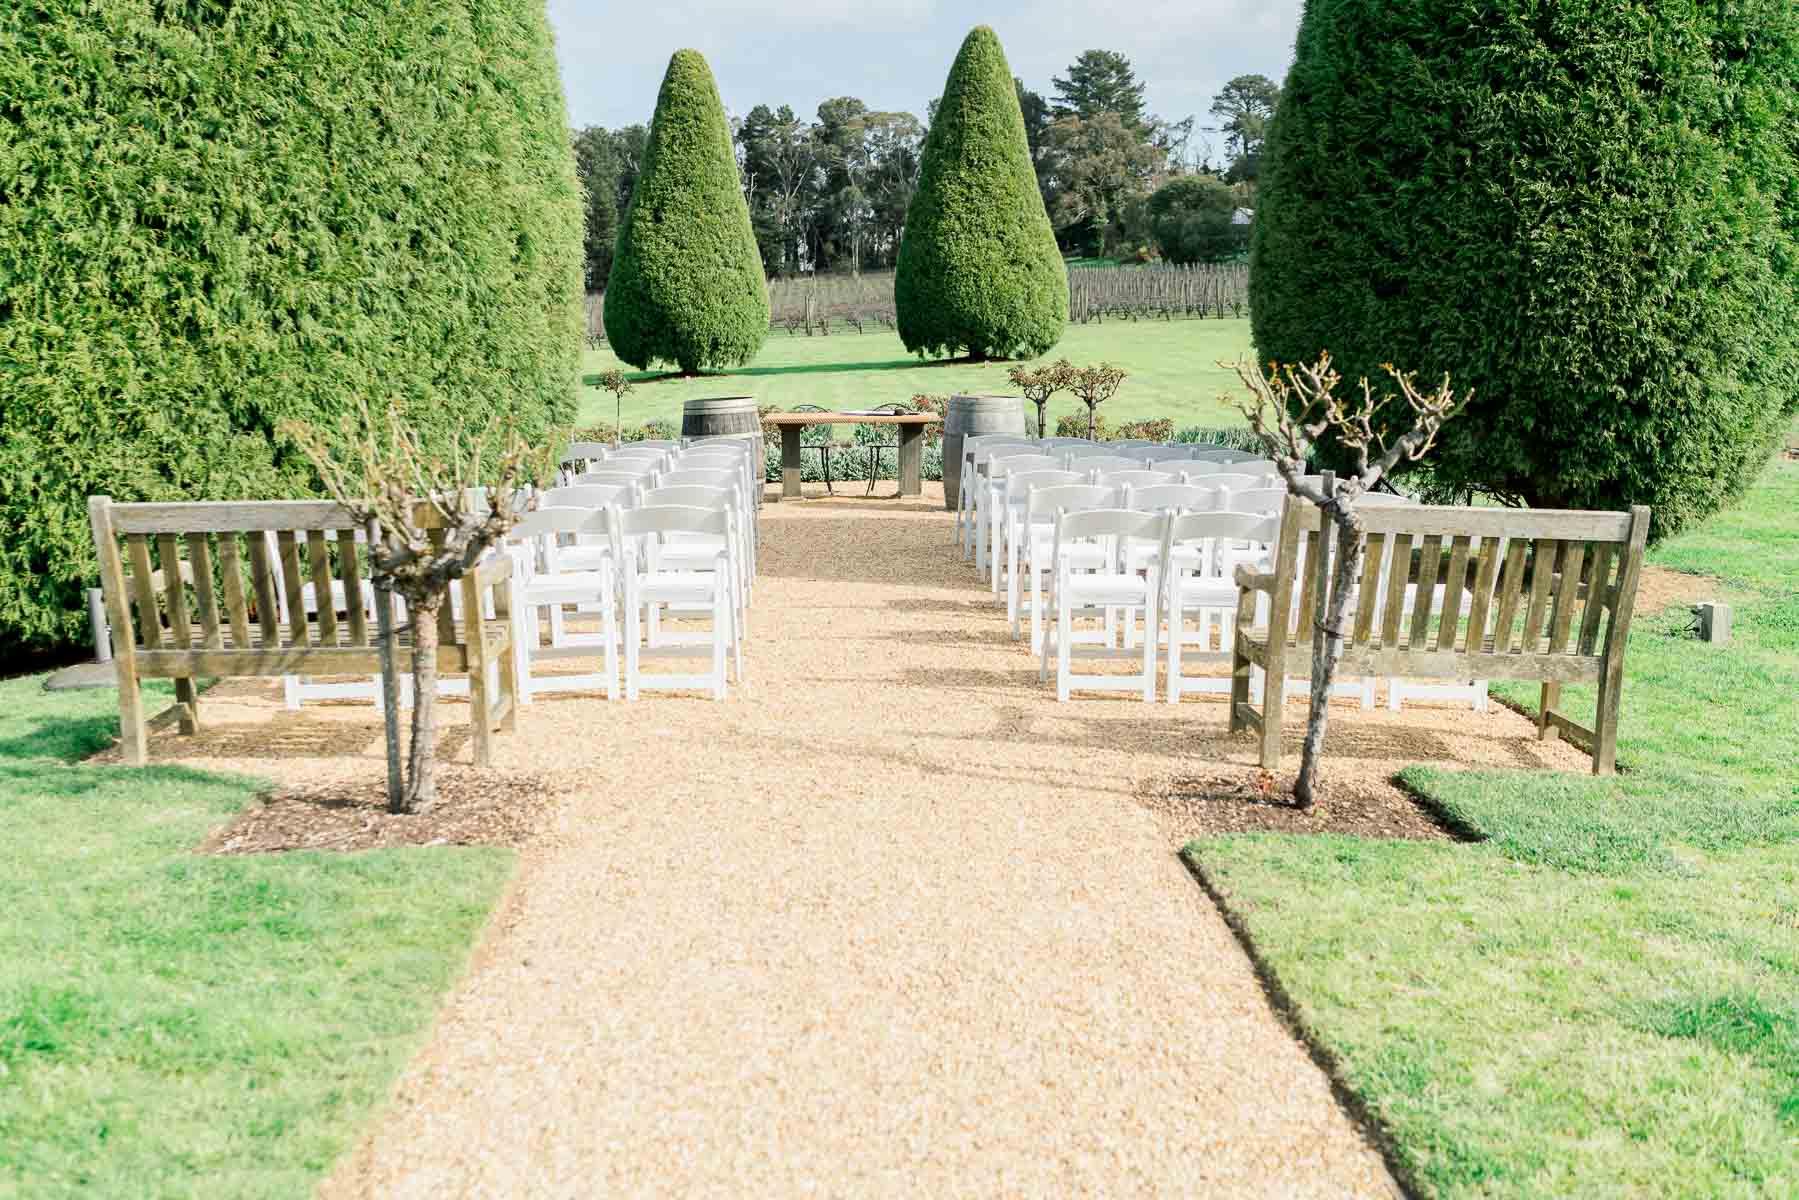 lindenderry-wedding-heart+soul-weddings-amy-alain-03117.jpg